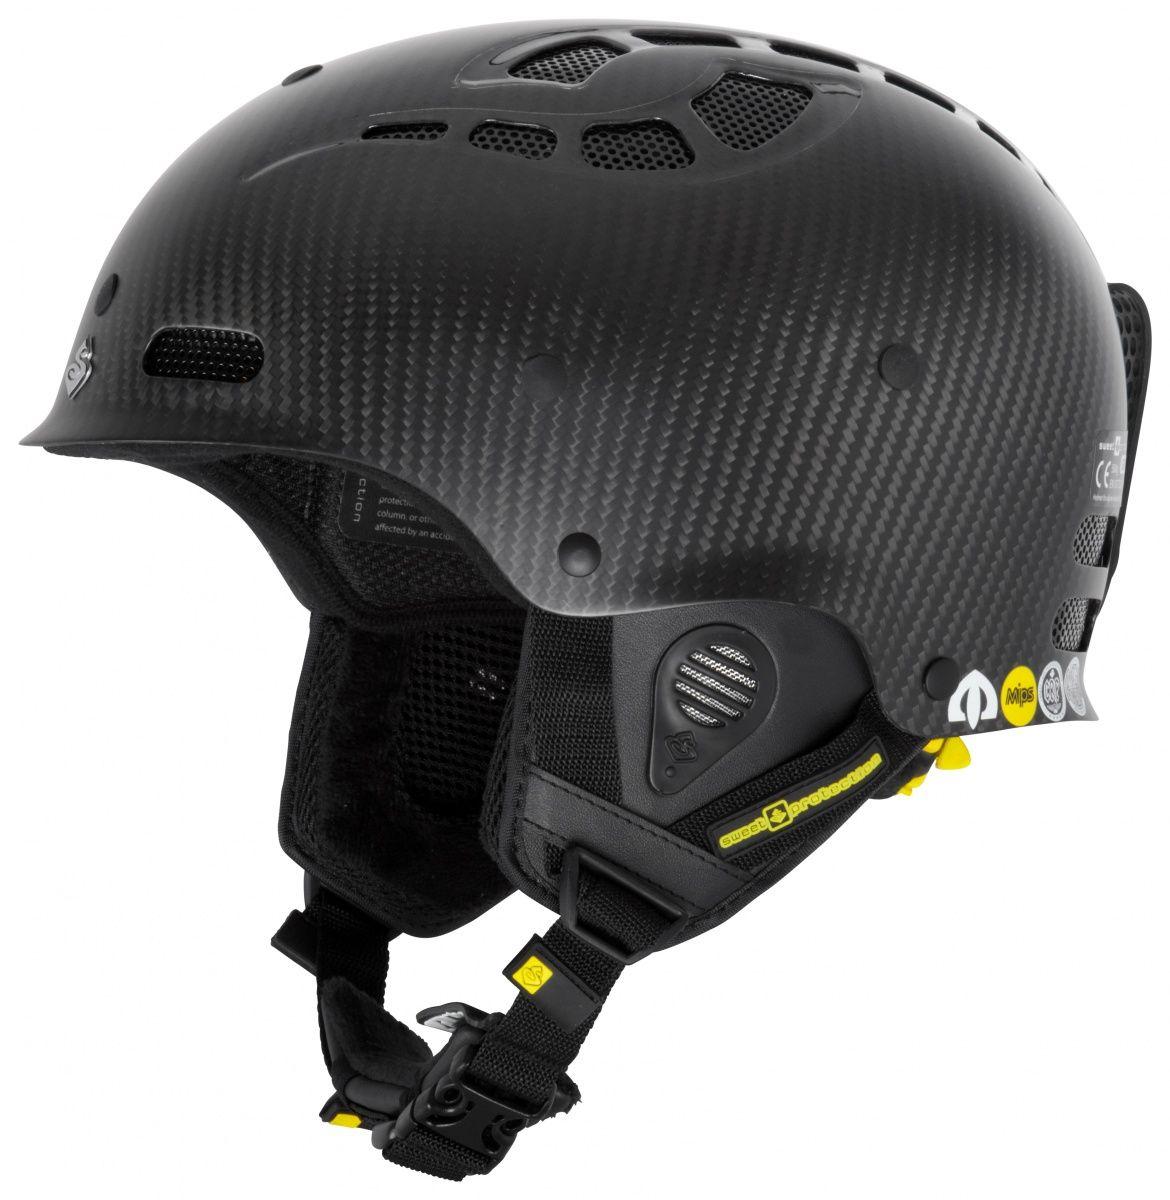 Grimnir Mips The Best Snowboard Ski Helmet Ever And It S Carbon